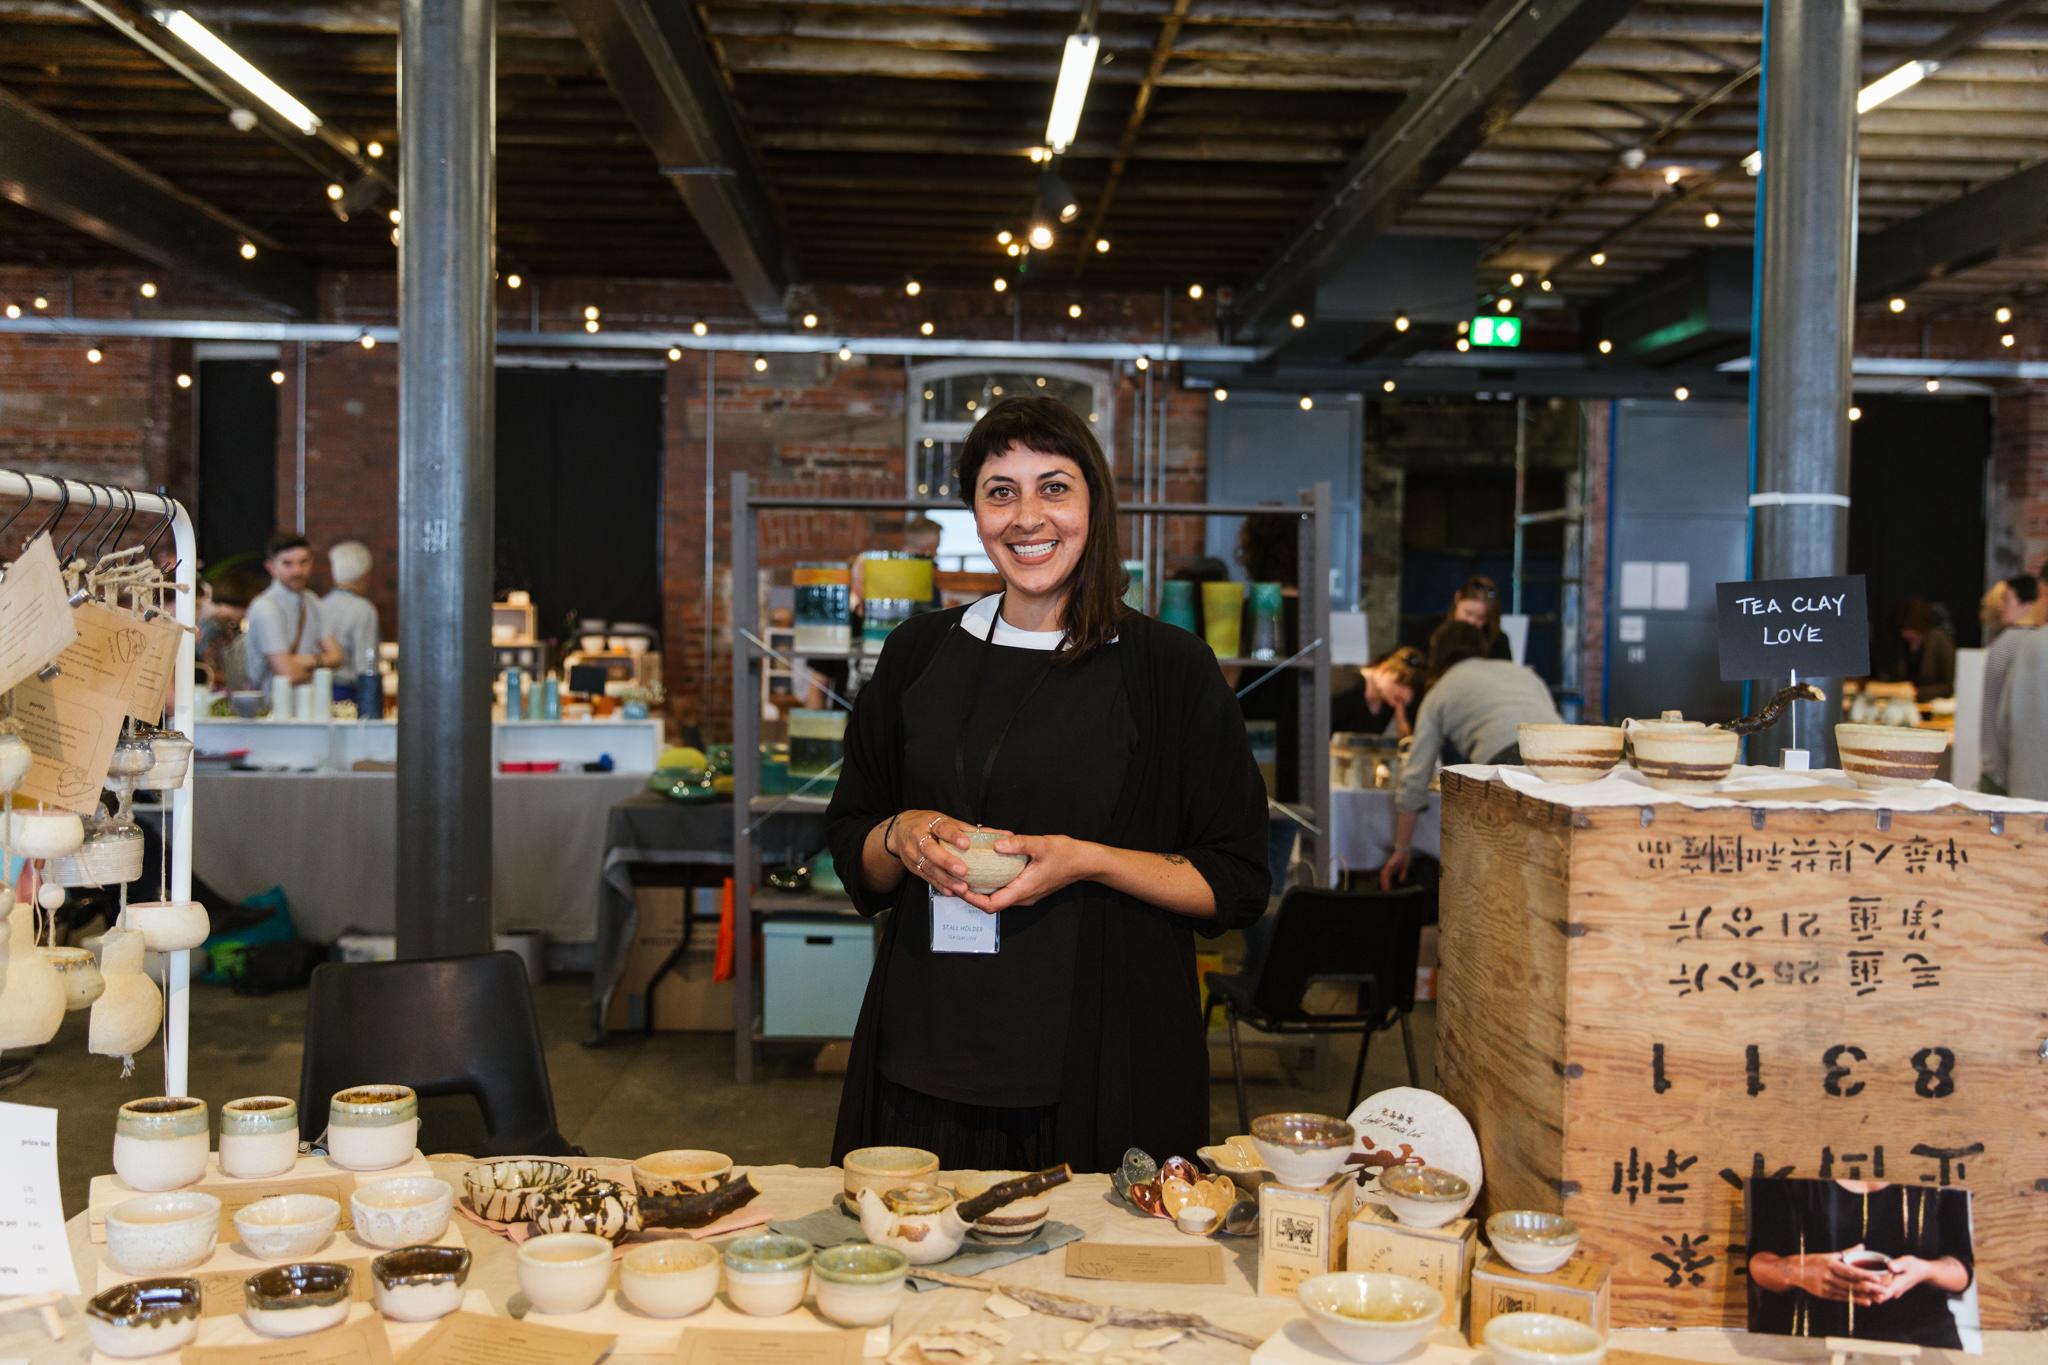 Hepworth-CeramicsFair-Joanne_Crawford-4269.JPG